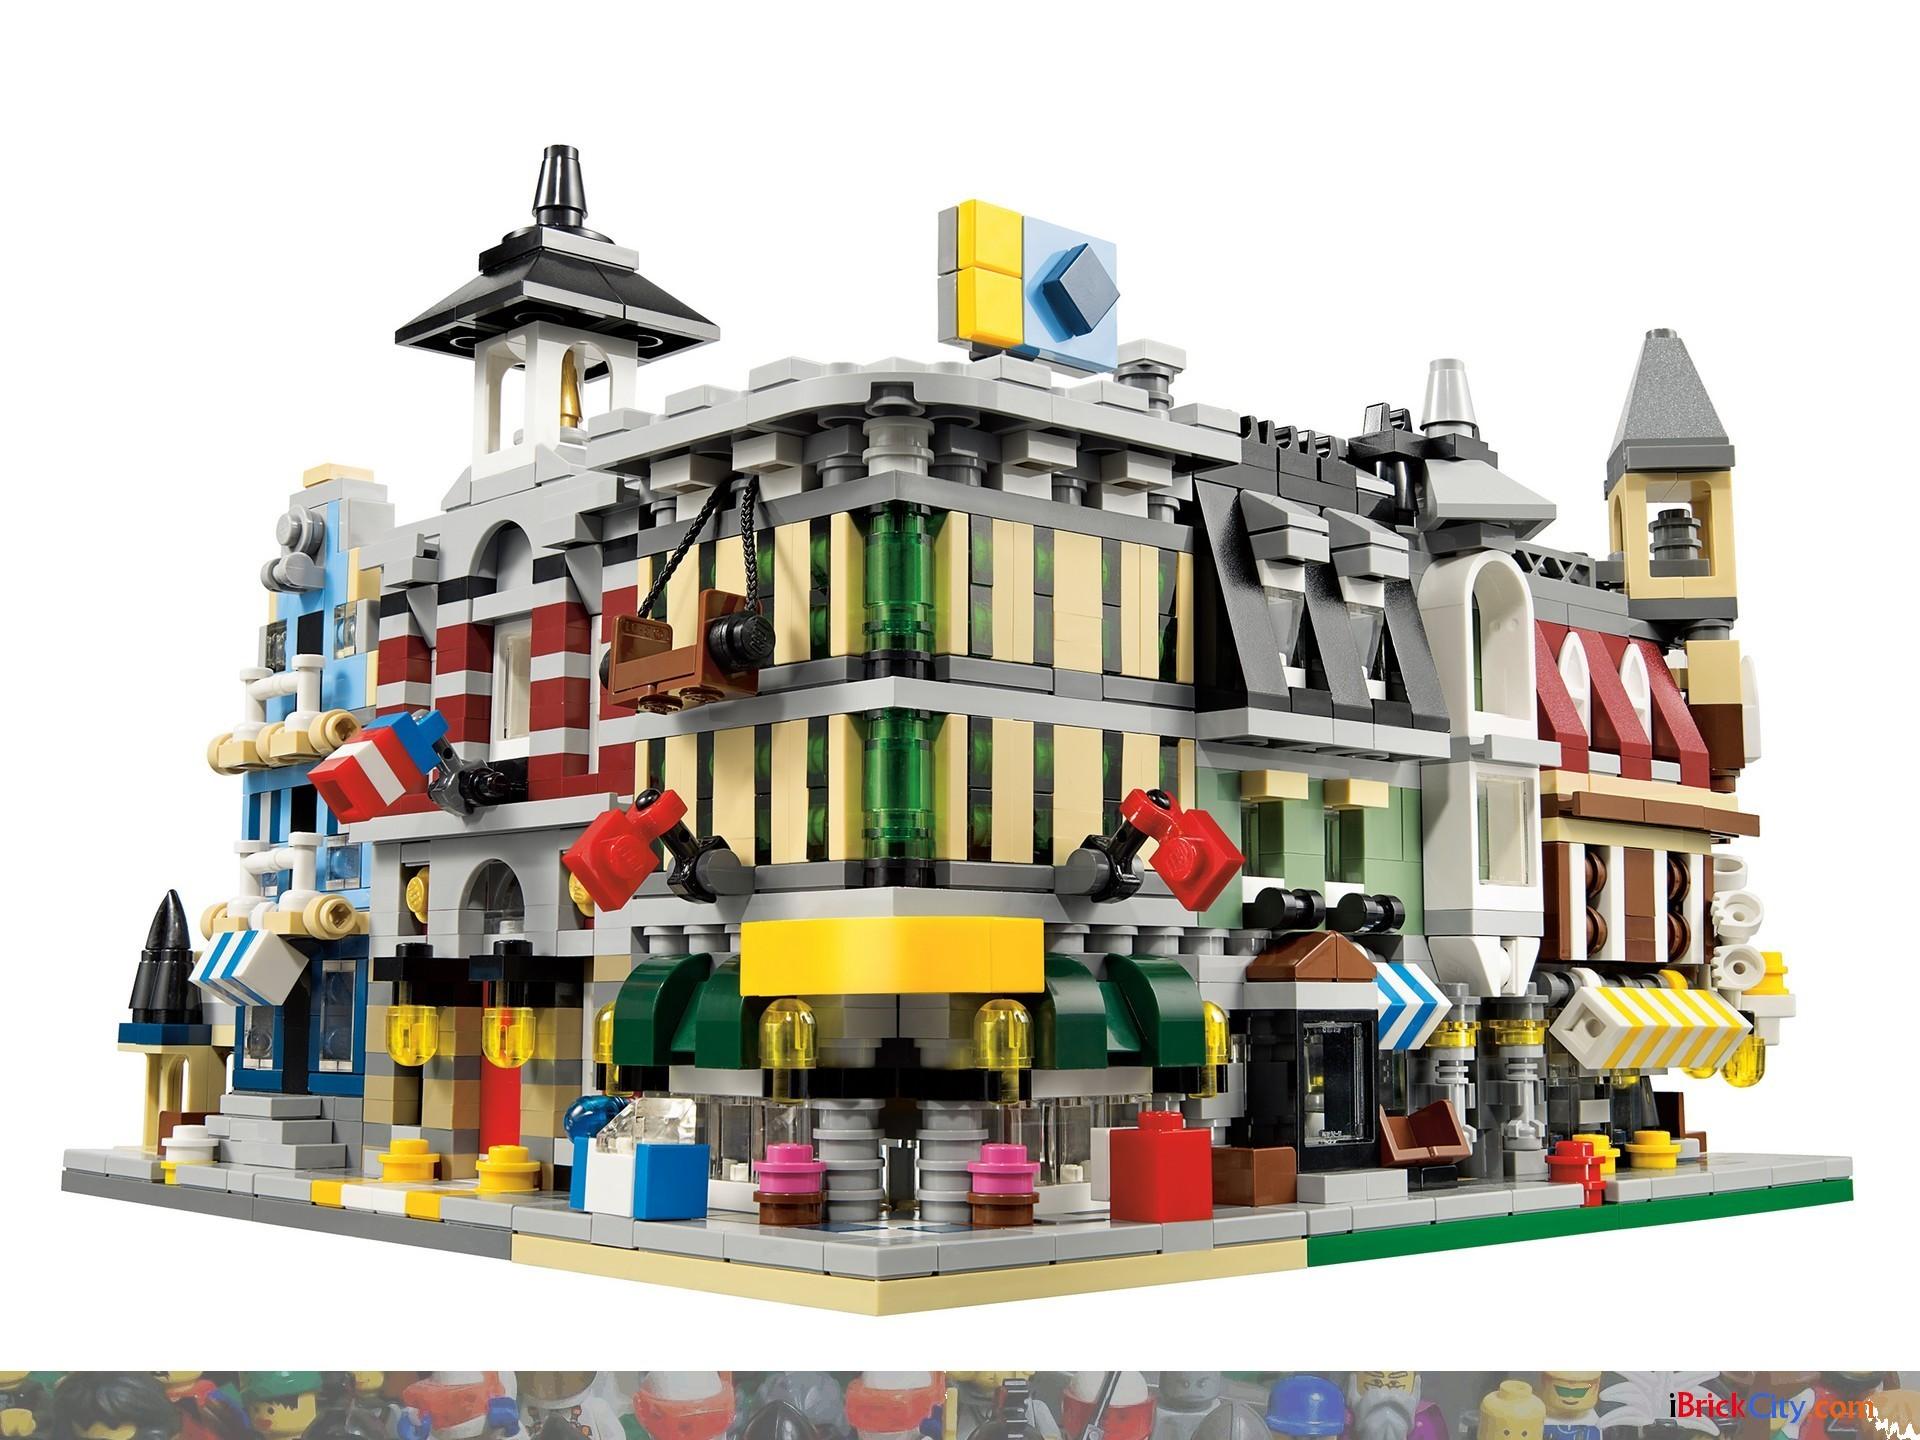 lego-wallpaper-pack-1-ibrickcity-5